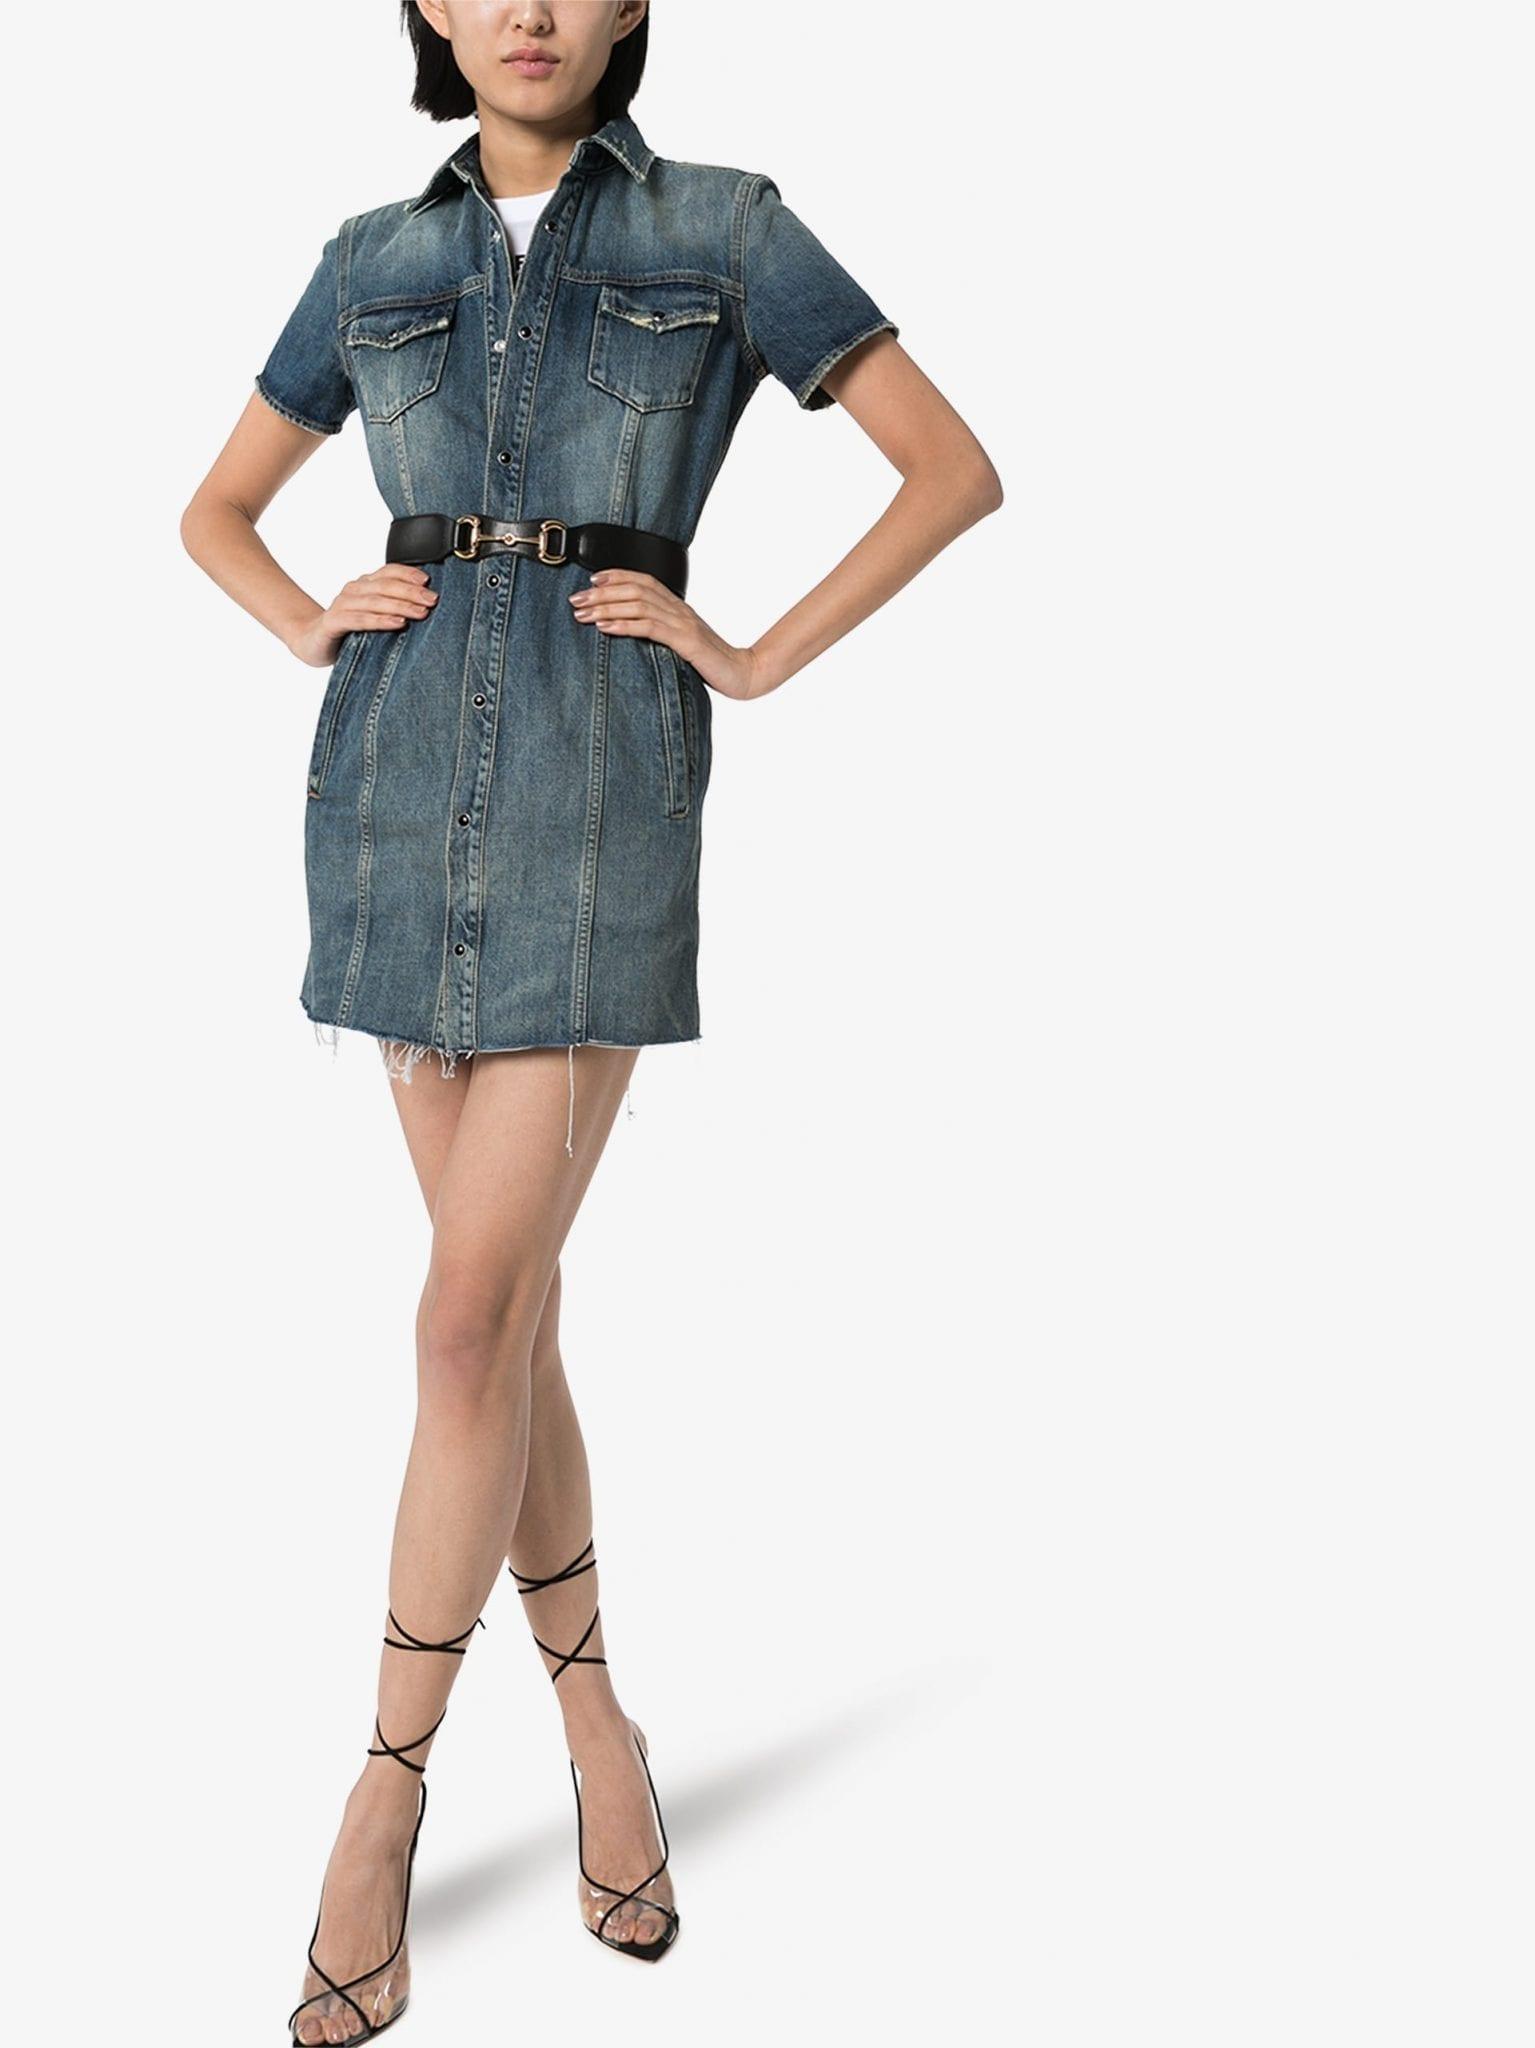 SAINT LAURENT Minikleid In Distressed-Optik Dress